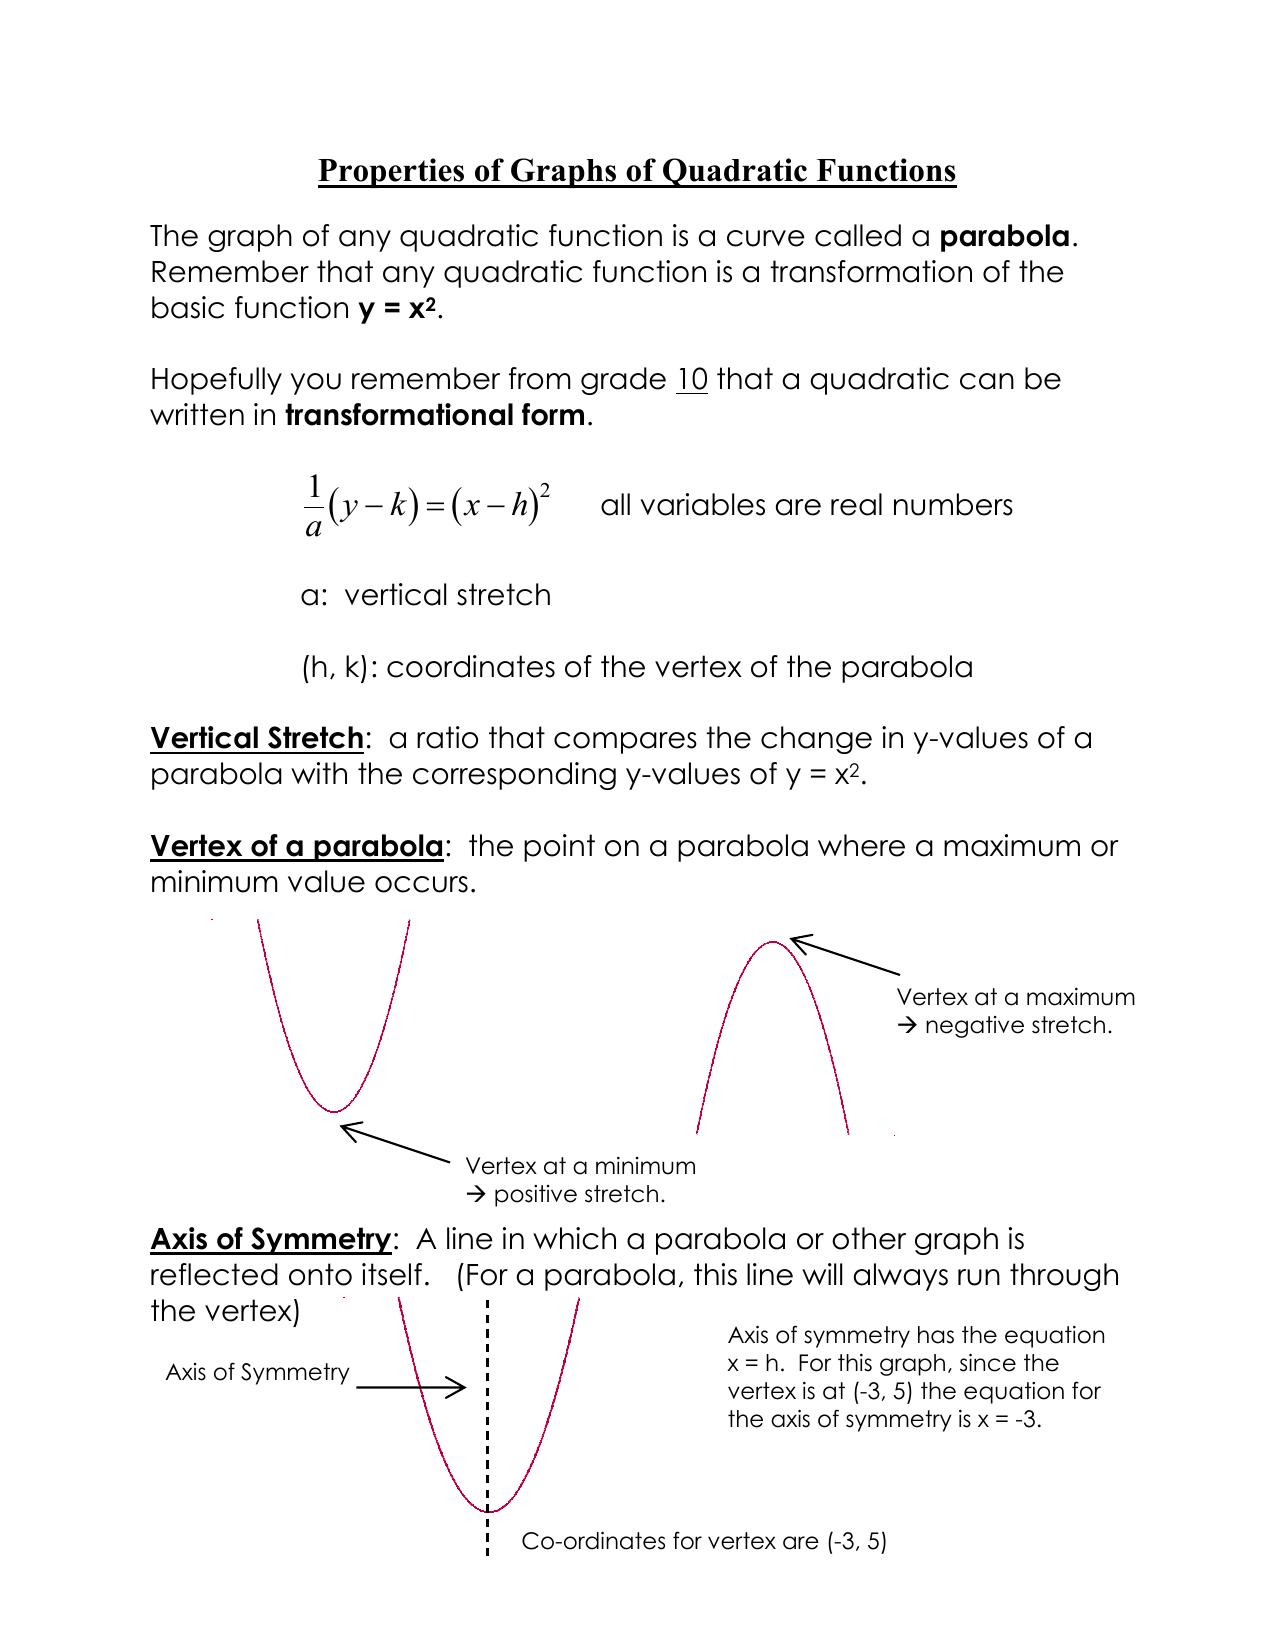 Quadratic Function Properties